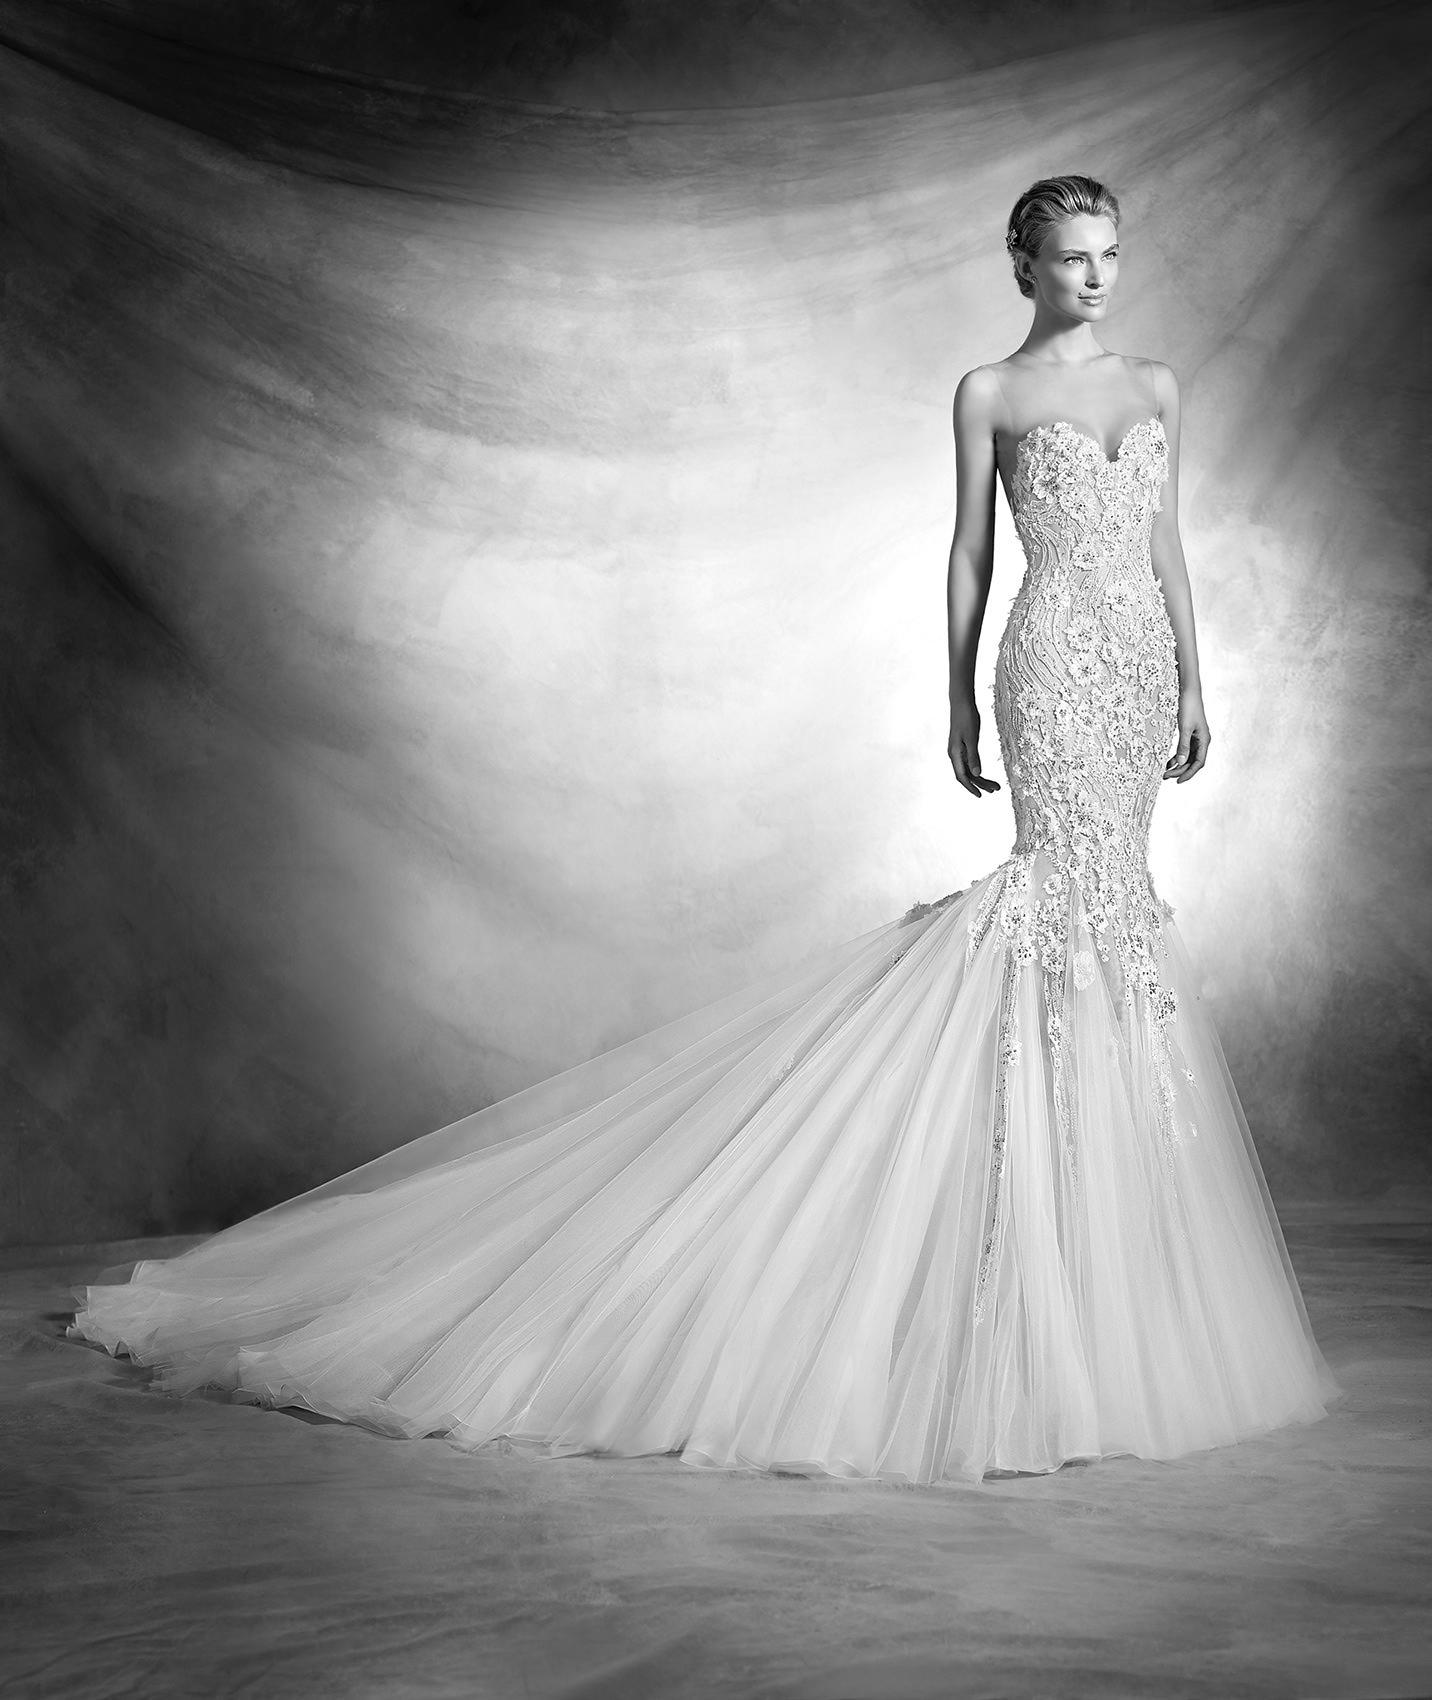 Veranda vestuvinė suknelė